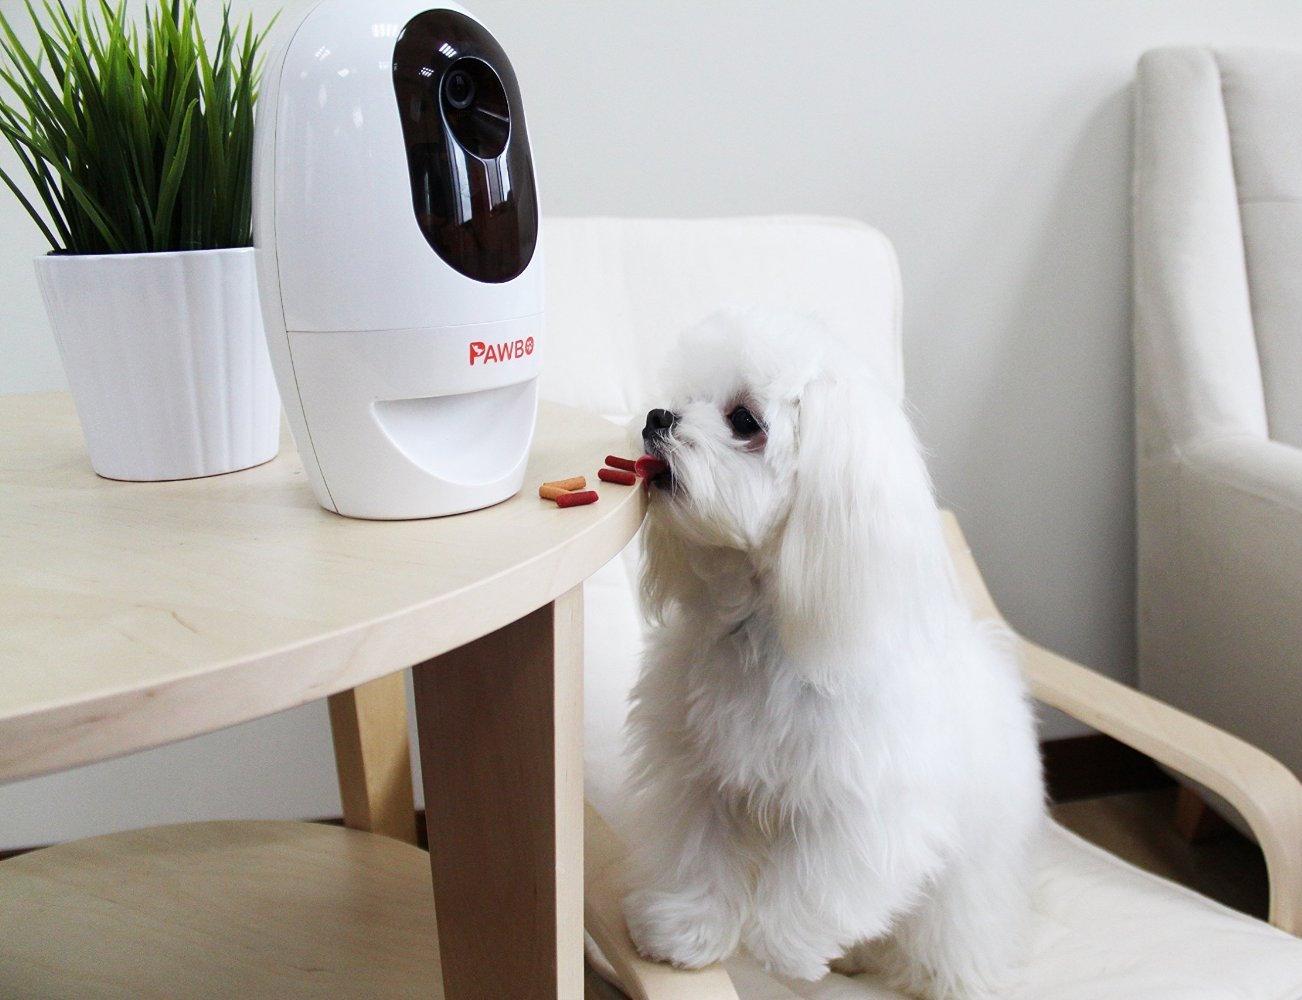 Pawbo Wi-Fi Pet Cam and Treat Dispenser